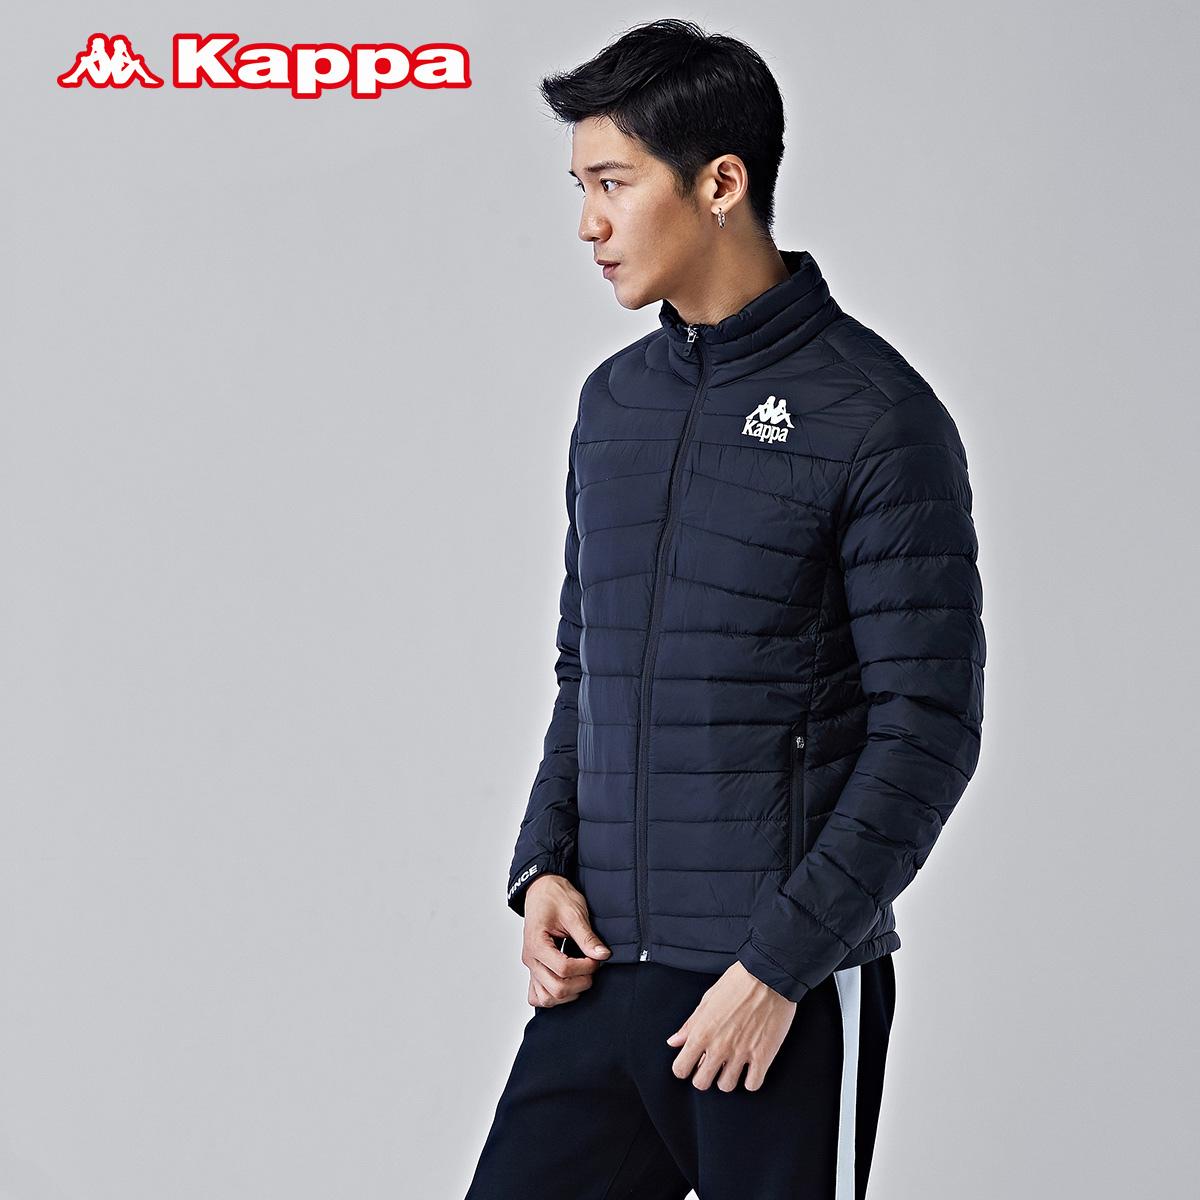 3d0e5379520 Shelves do not-Kappa men's down jacket sports jacket down jacket coat)  K0652YY09